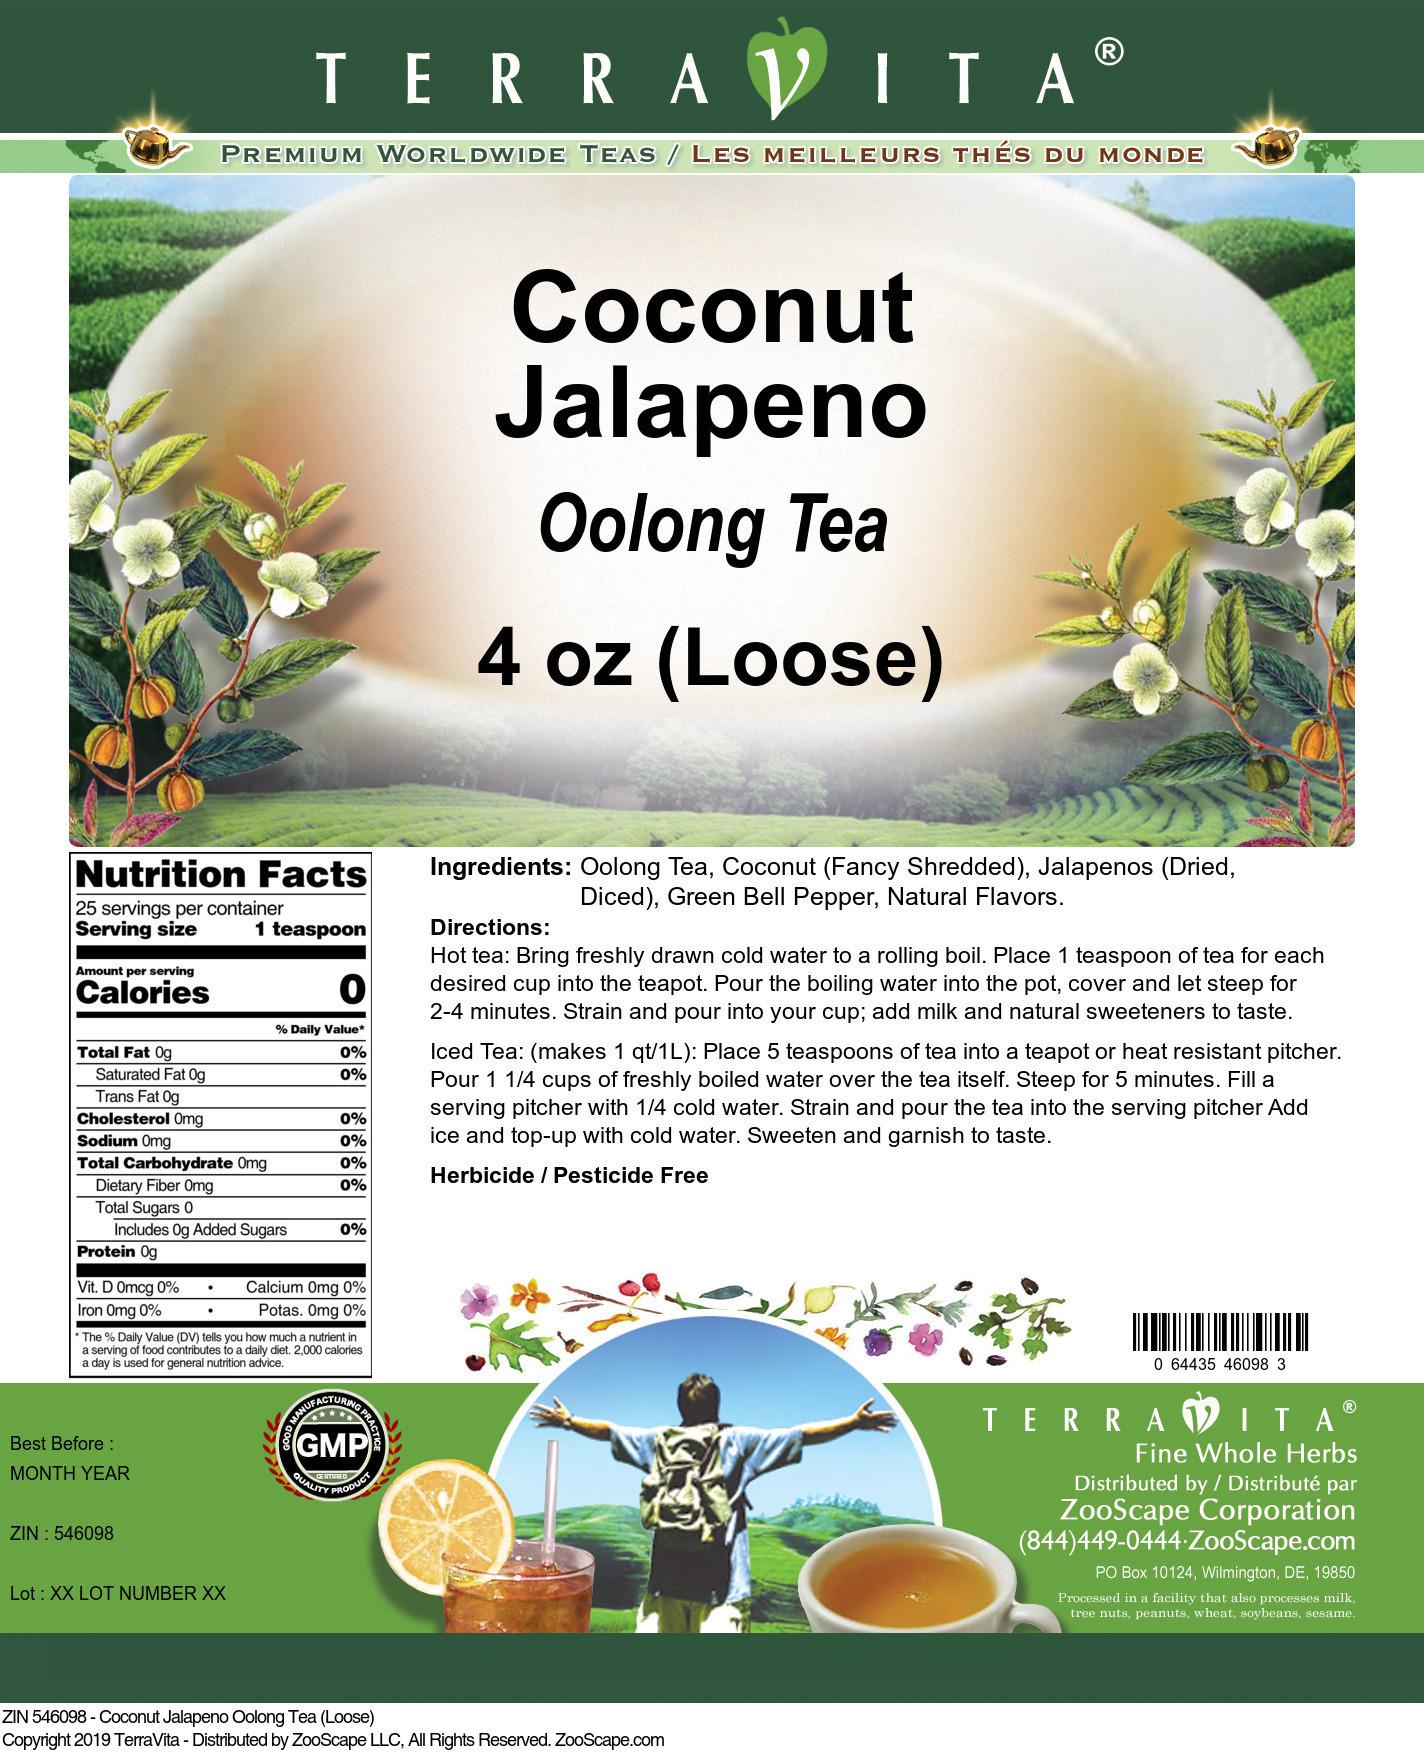 Coconut Jalapeno Oolong Tea (Loose)